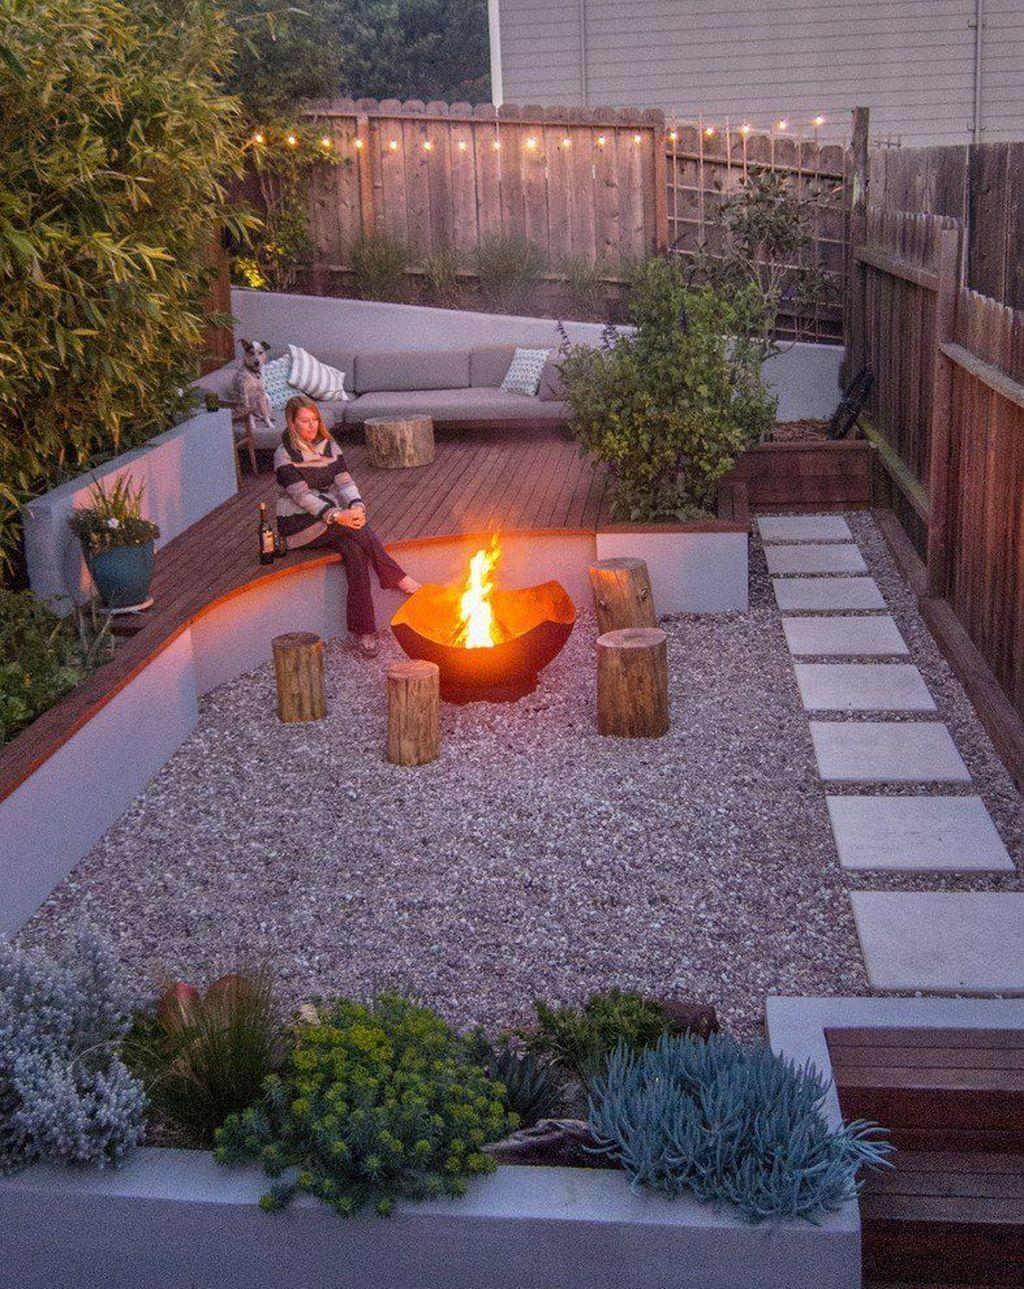 Low Cost Modern Garden Ideas On A Budget